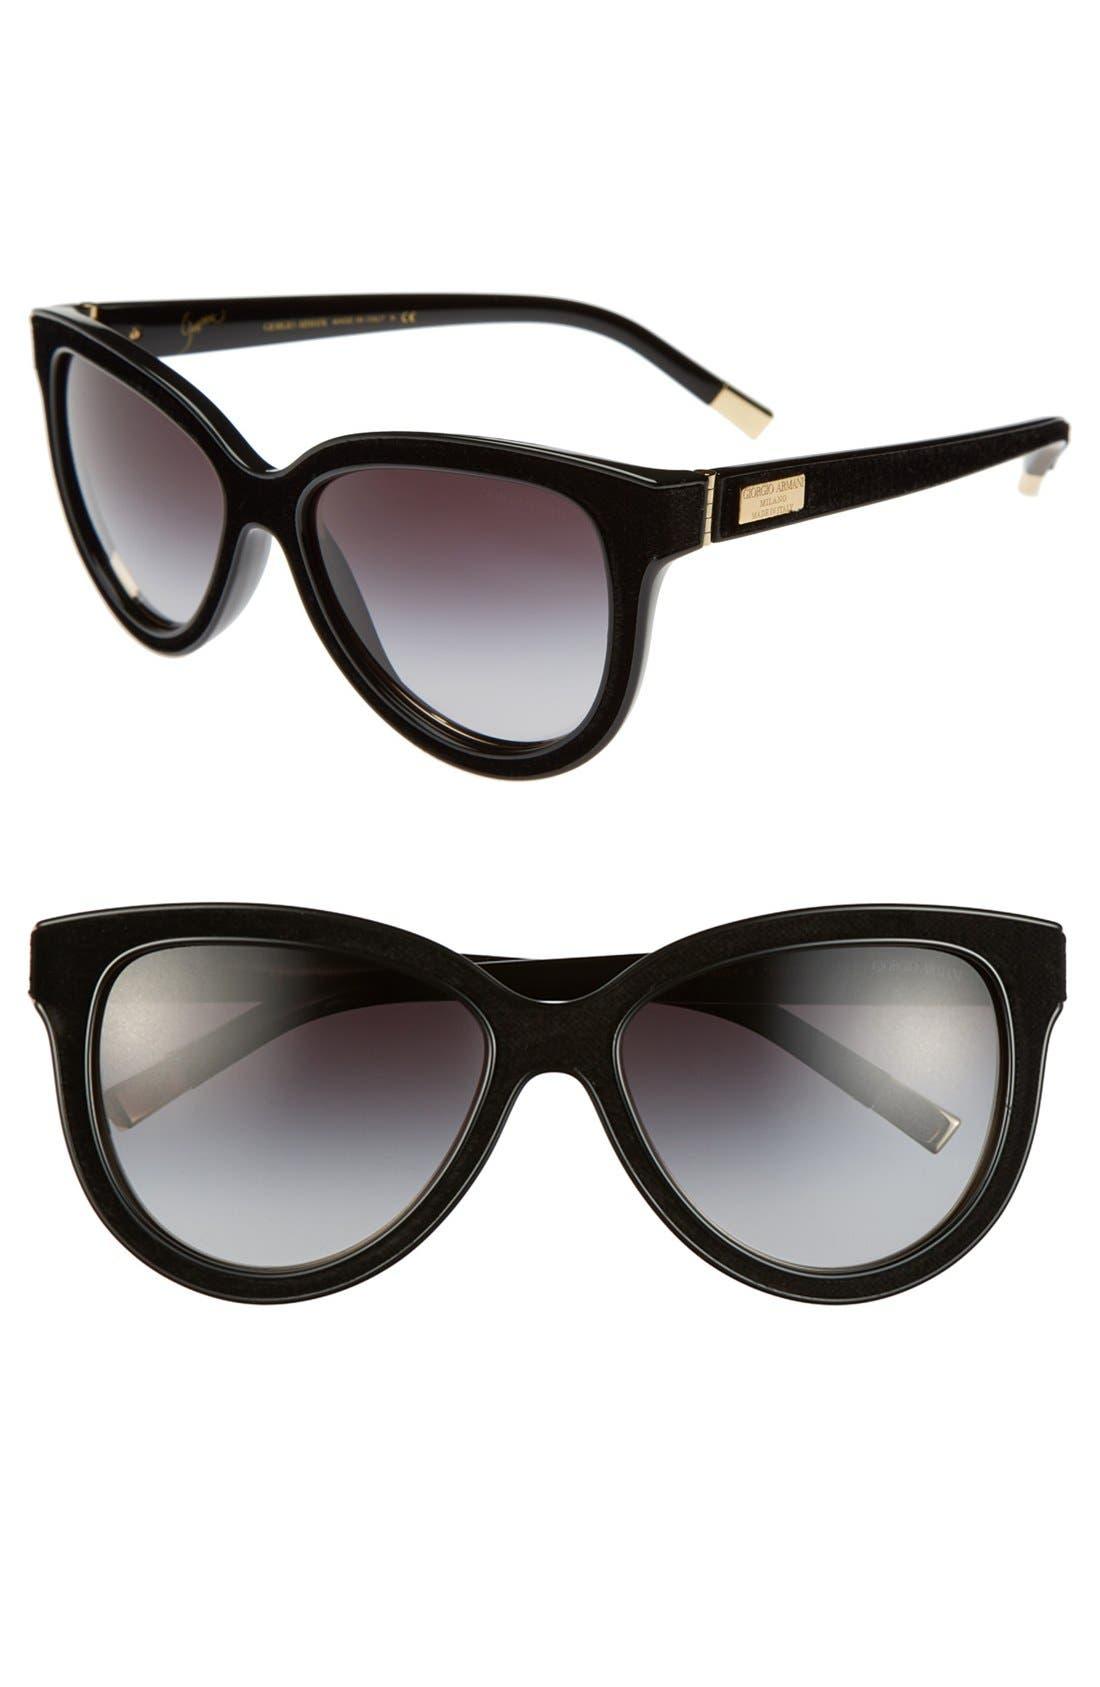 Alternate Image 1 Selected - Giorgio Armani 'Garçonne' 57mm Cat Eye Sunglasses